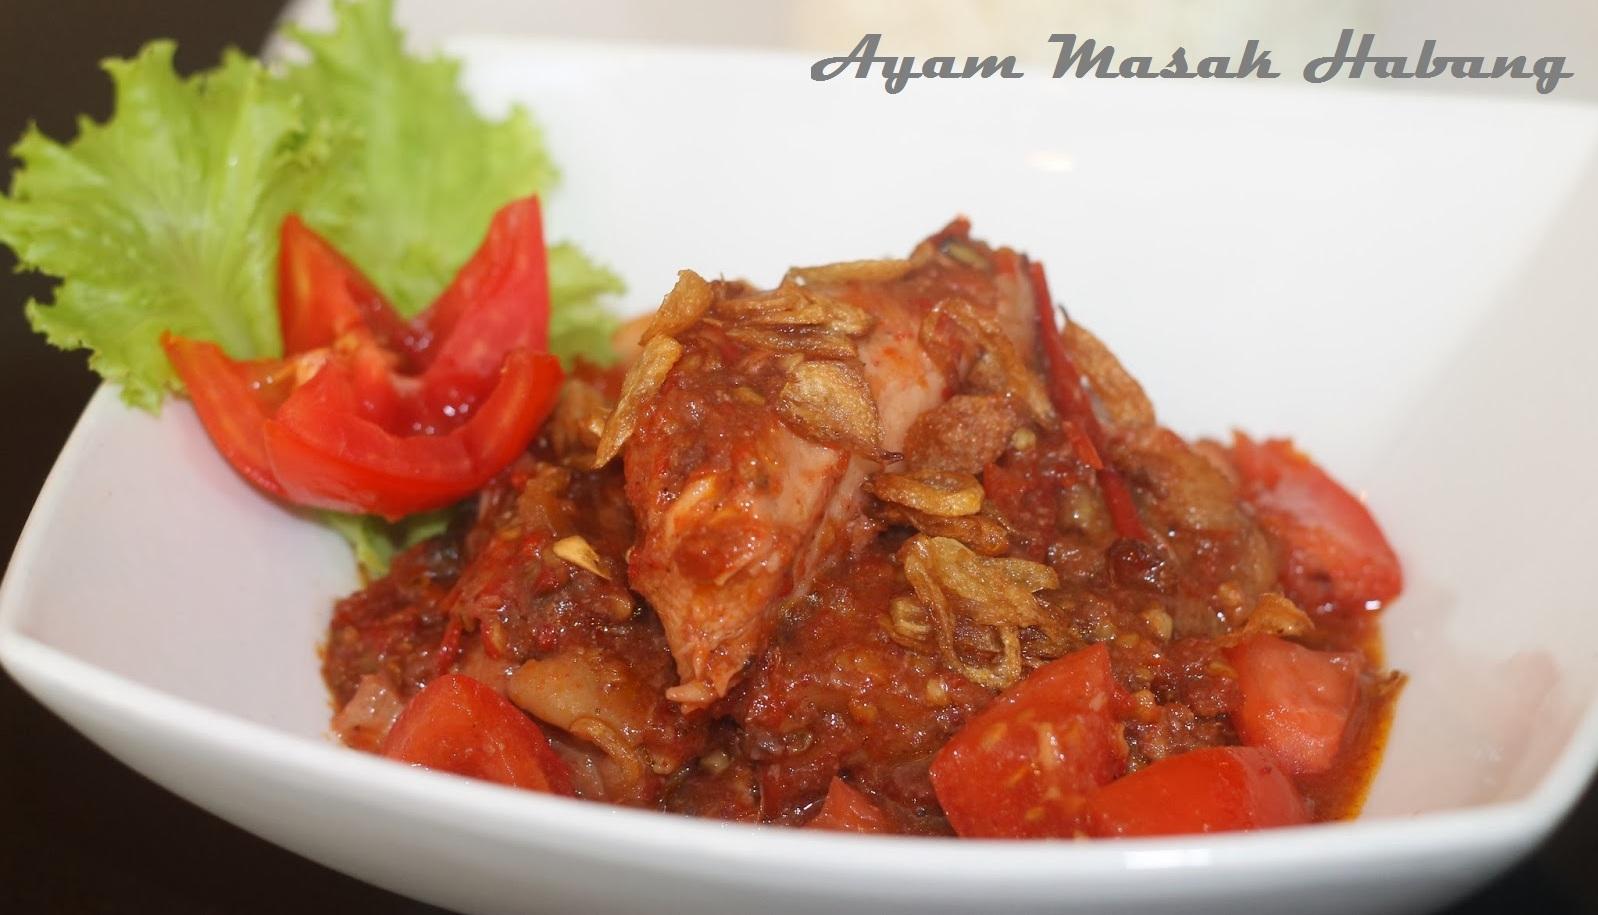 Resep Ayam Masak Habang (Samarinda)